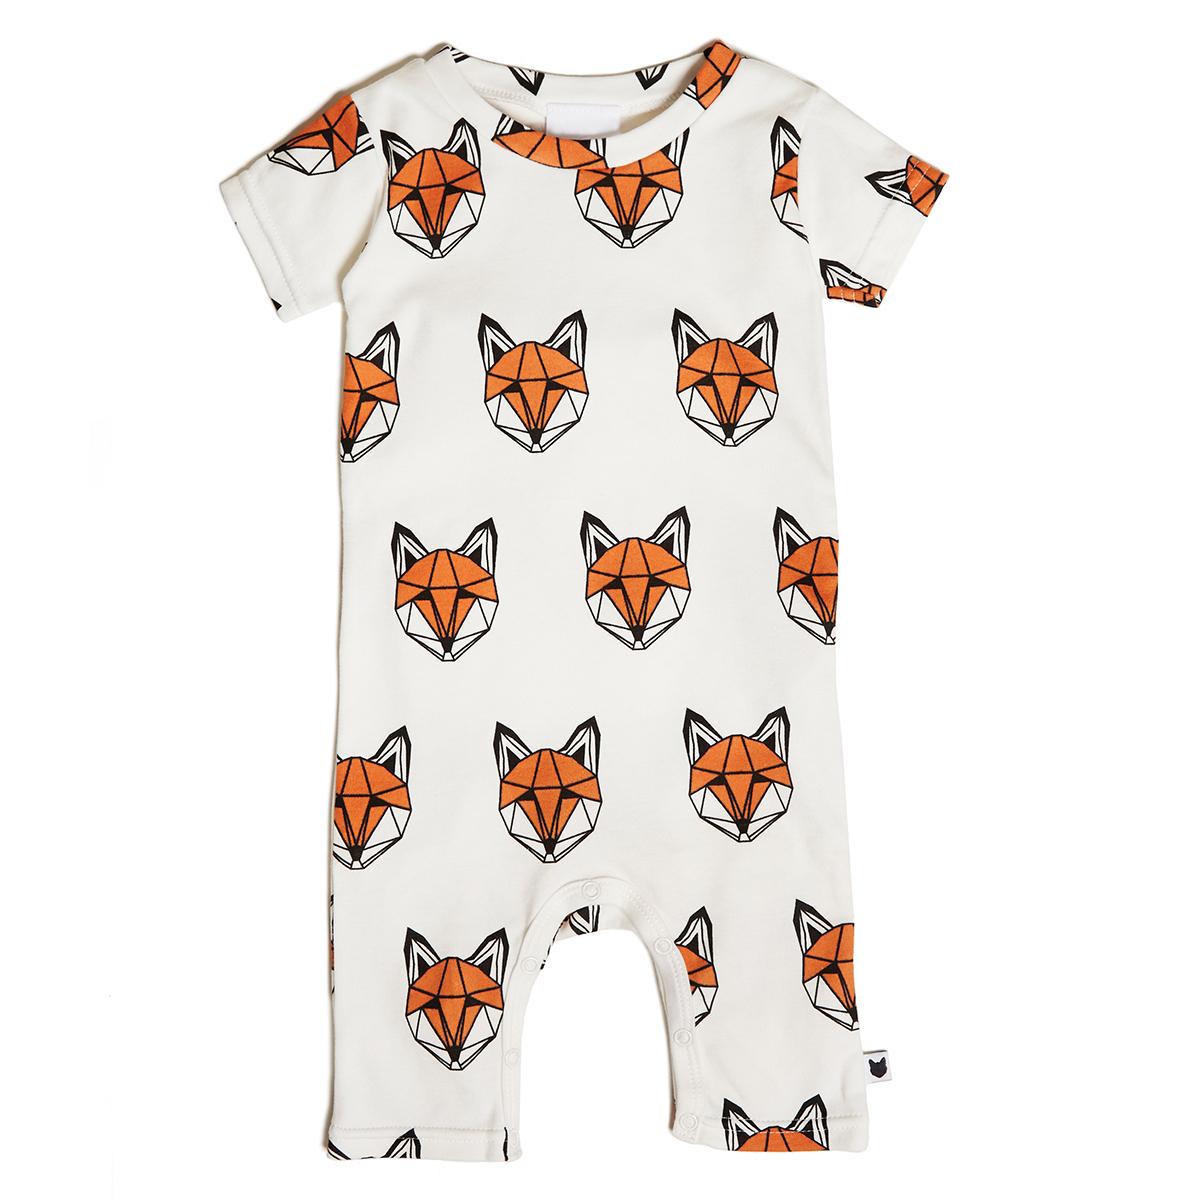 Robe & combinaison Combinaison Just Call Me Fox - 6/12 Mois Combinaison Just Call Me Fox - 6/12 Mois